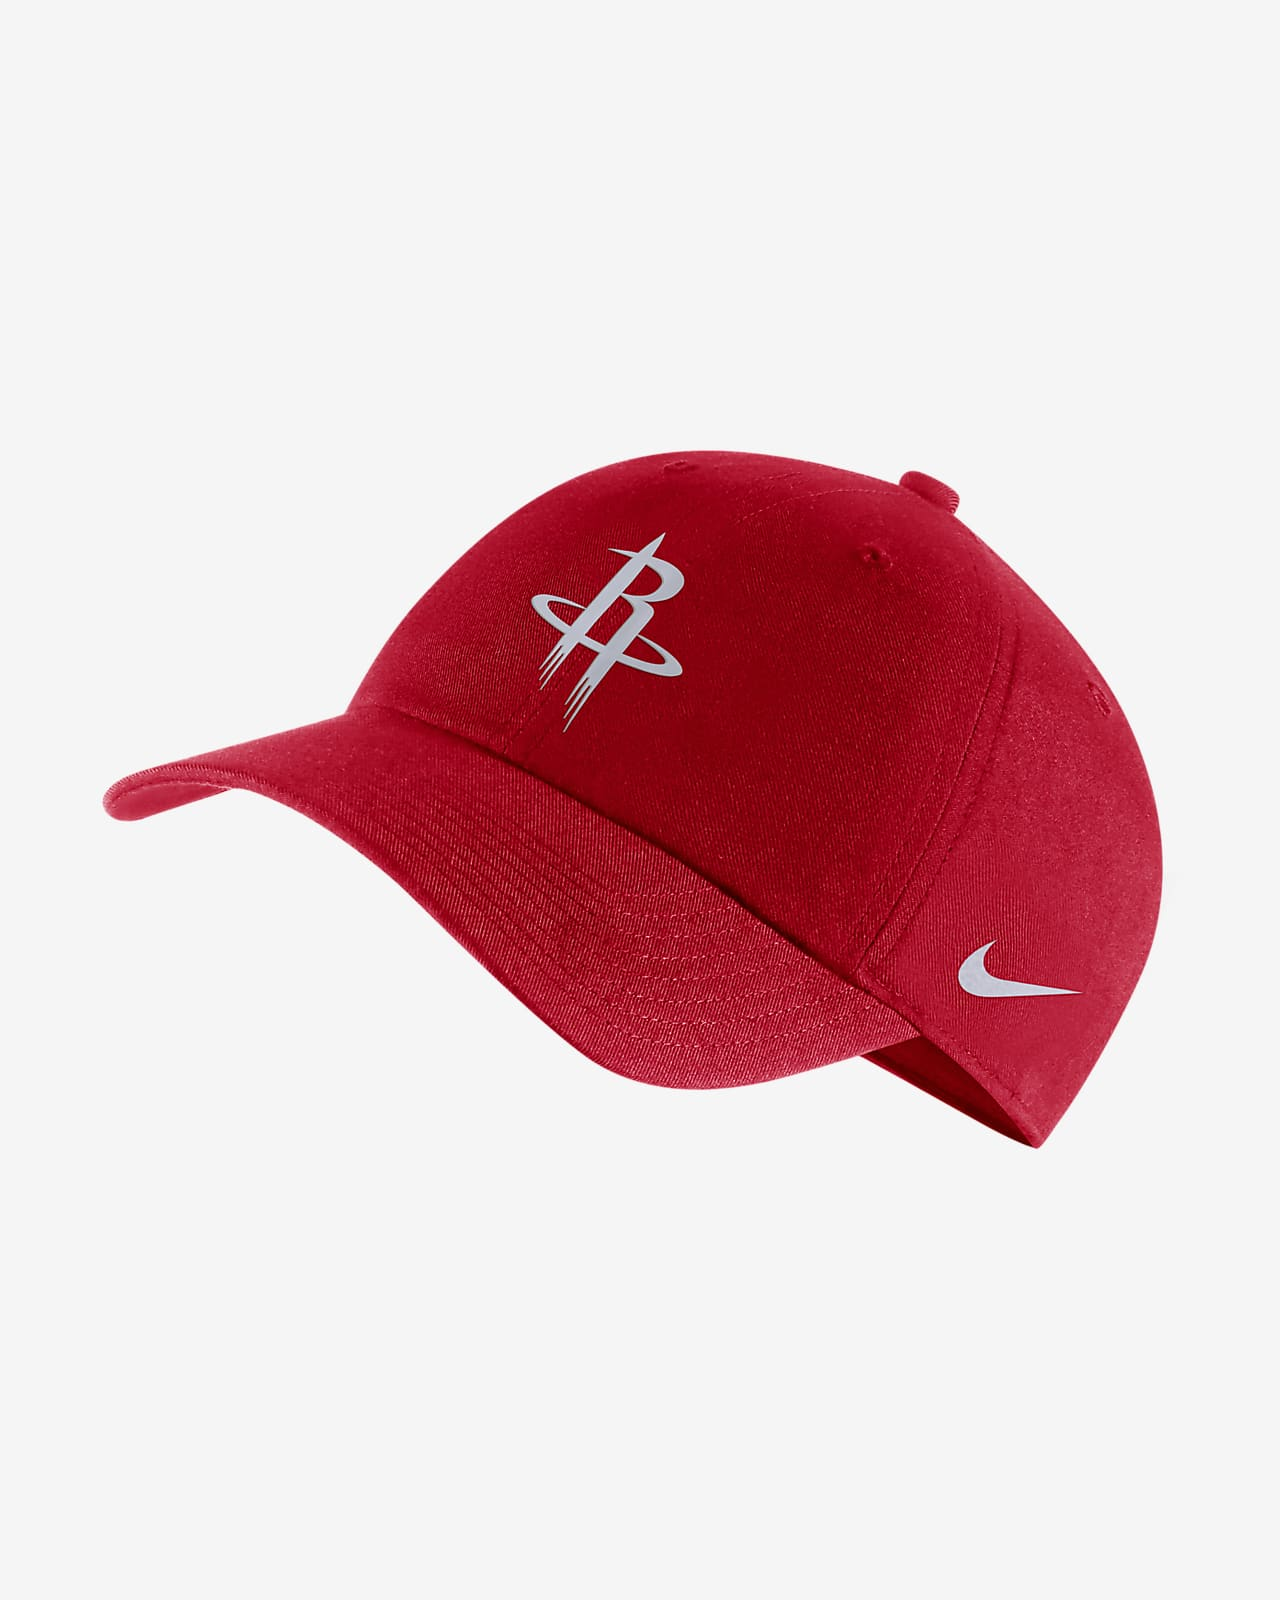 Rockets Heritage86 Nike Dri-FIT NBA Cap